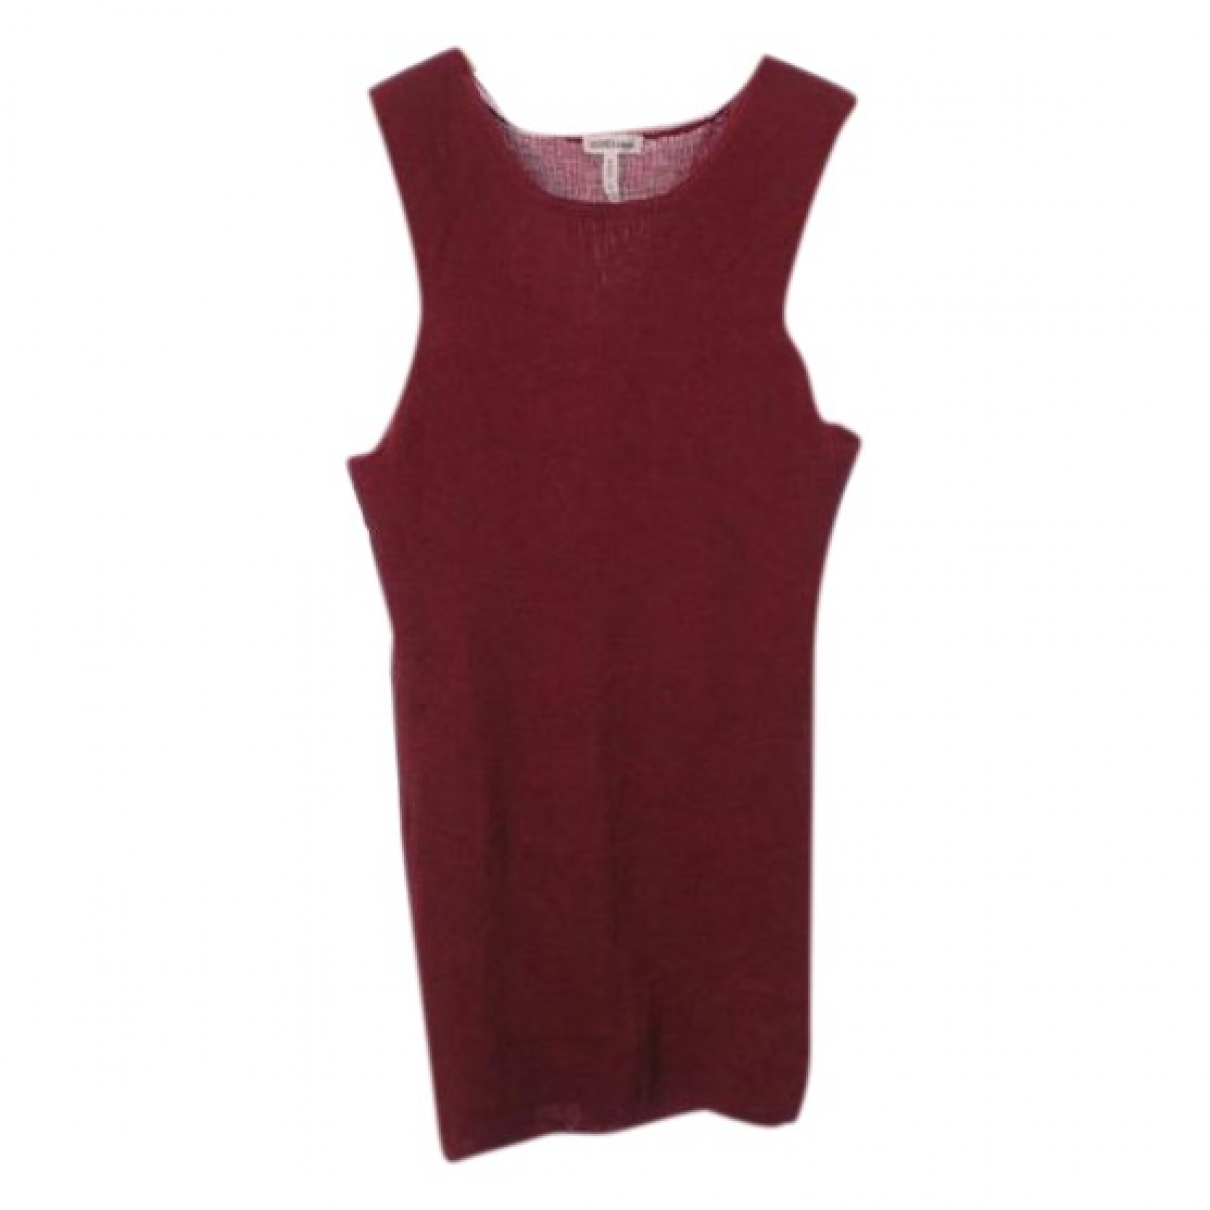 Hermès \N Red Cashmere  top for Women XL International